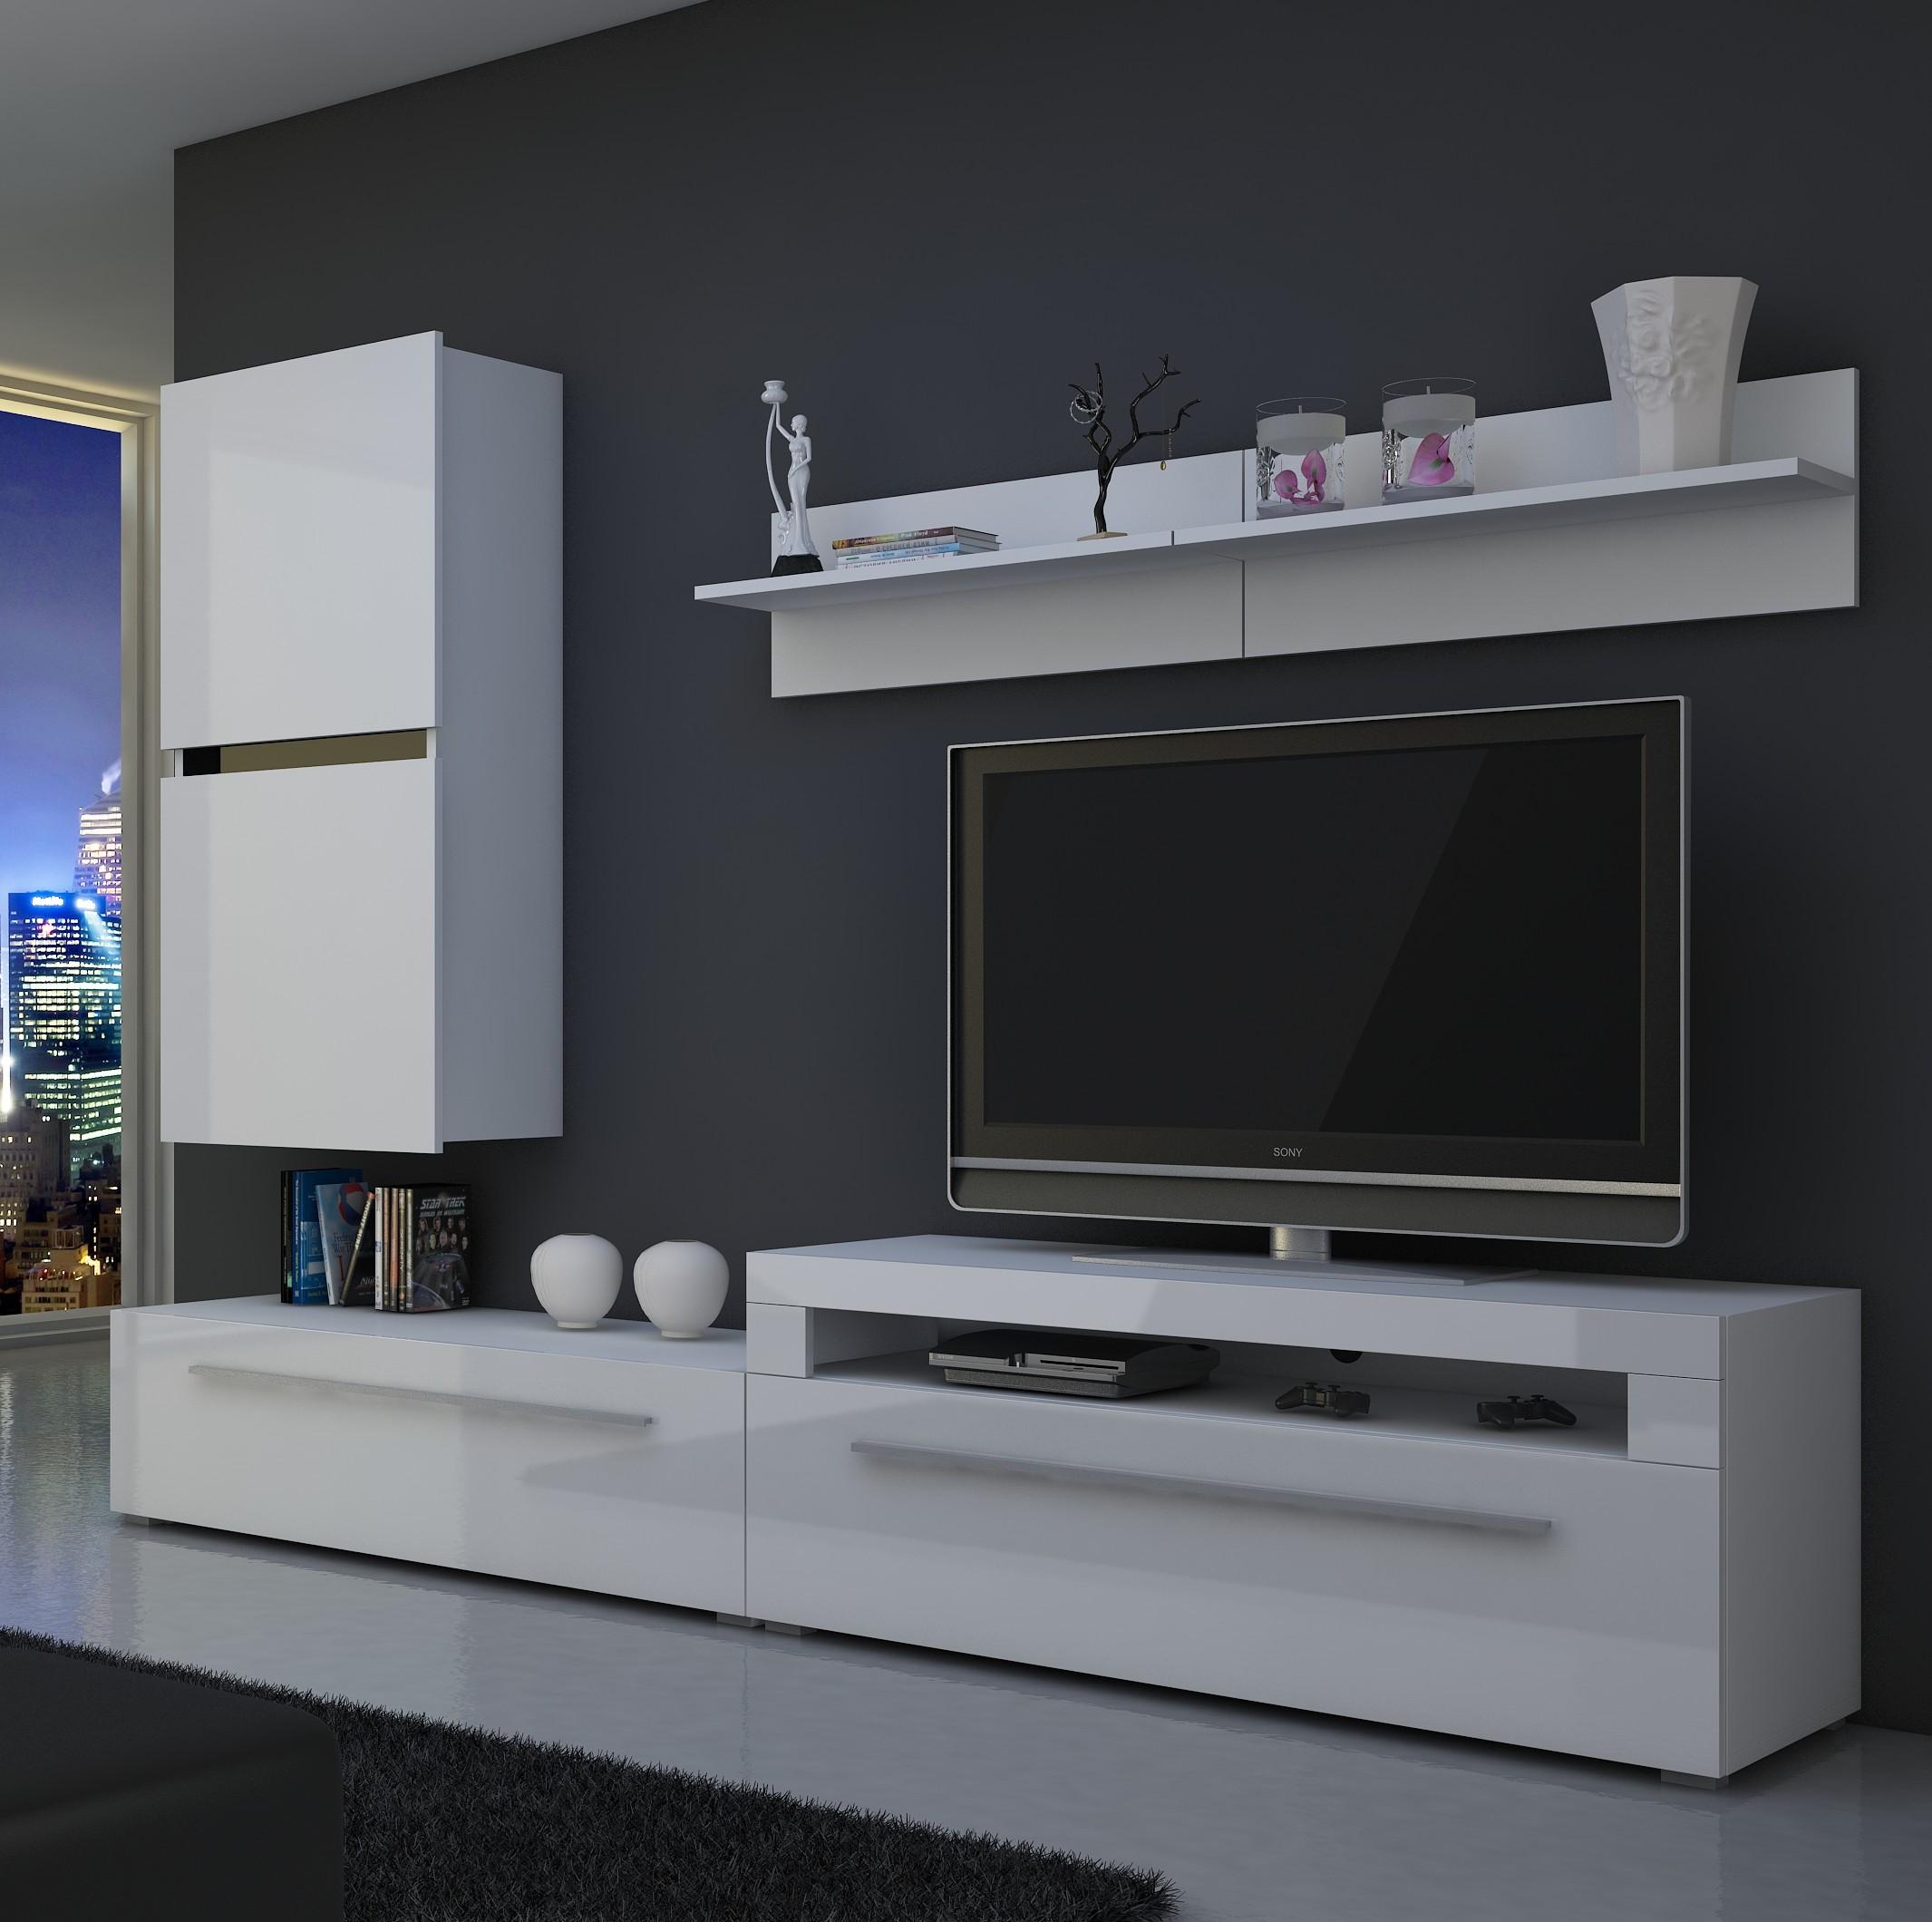 moebel24 pl wohnwand bonn hochglanz mit beleuchtung. Black Bedroom Furniture Sets. Home Design Ideas